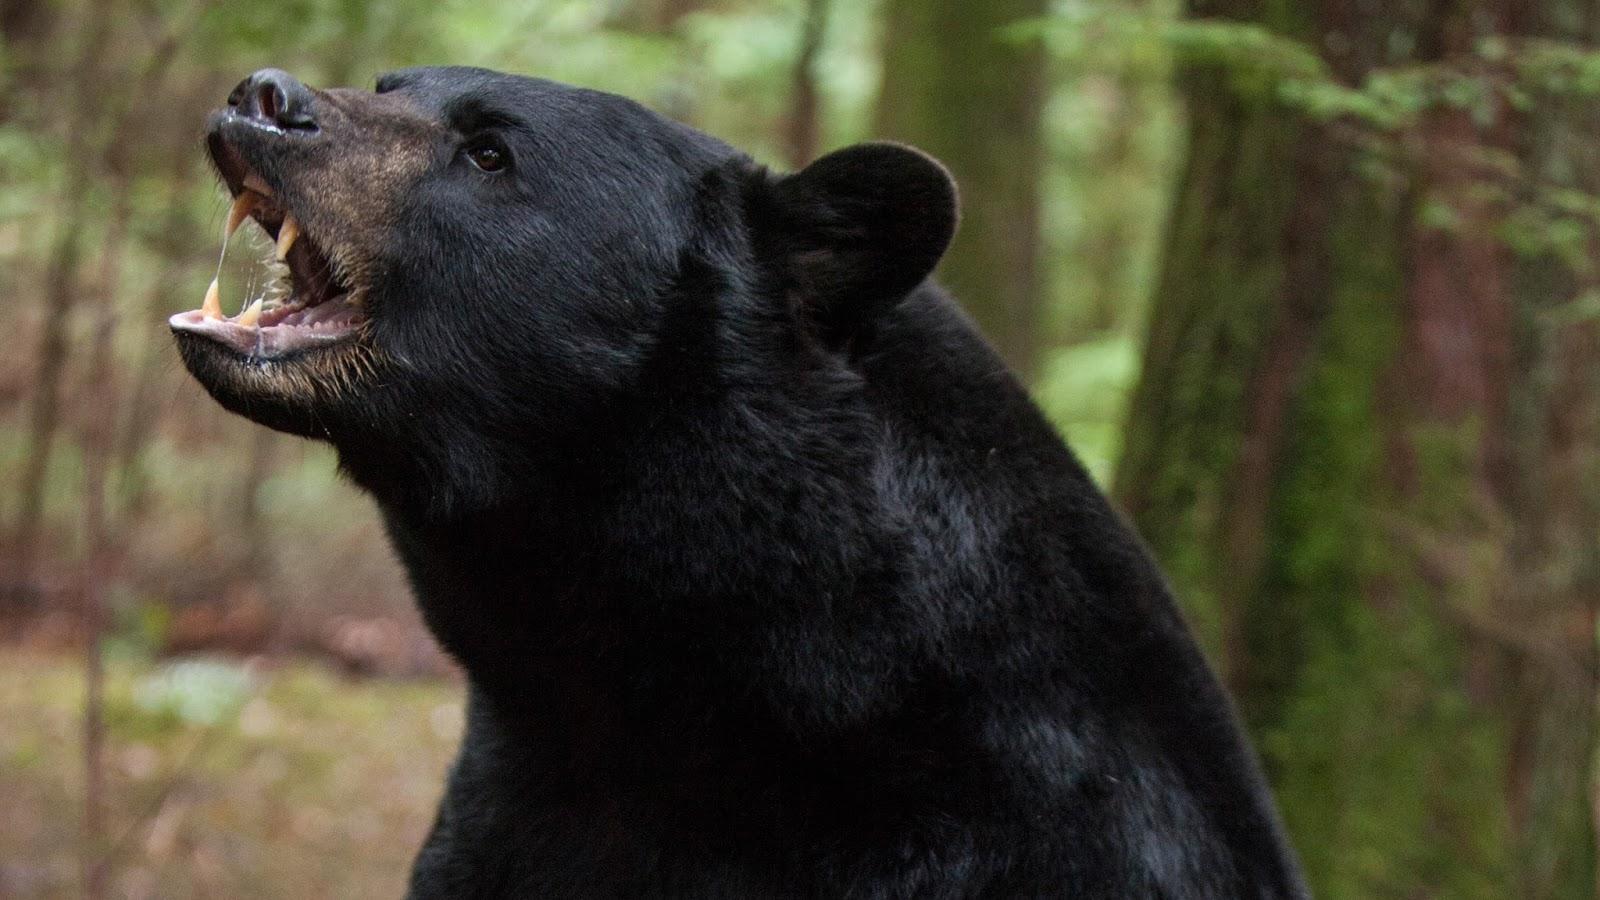 En el bosque sobrevive (Backcountry) 2014 Black-bear-backcountry-movie_h